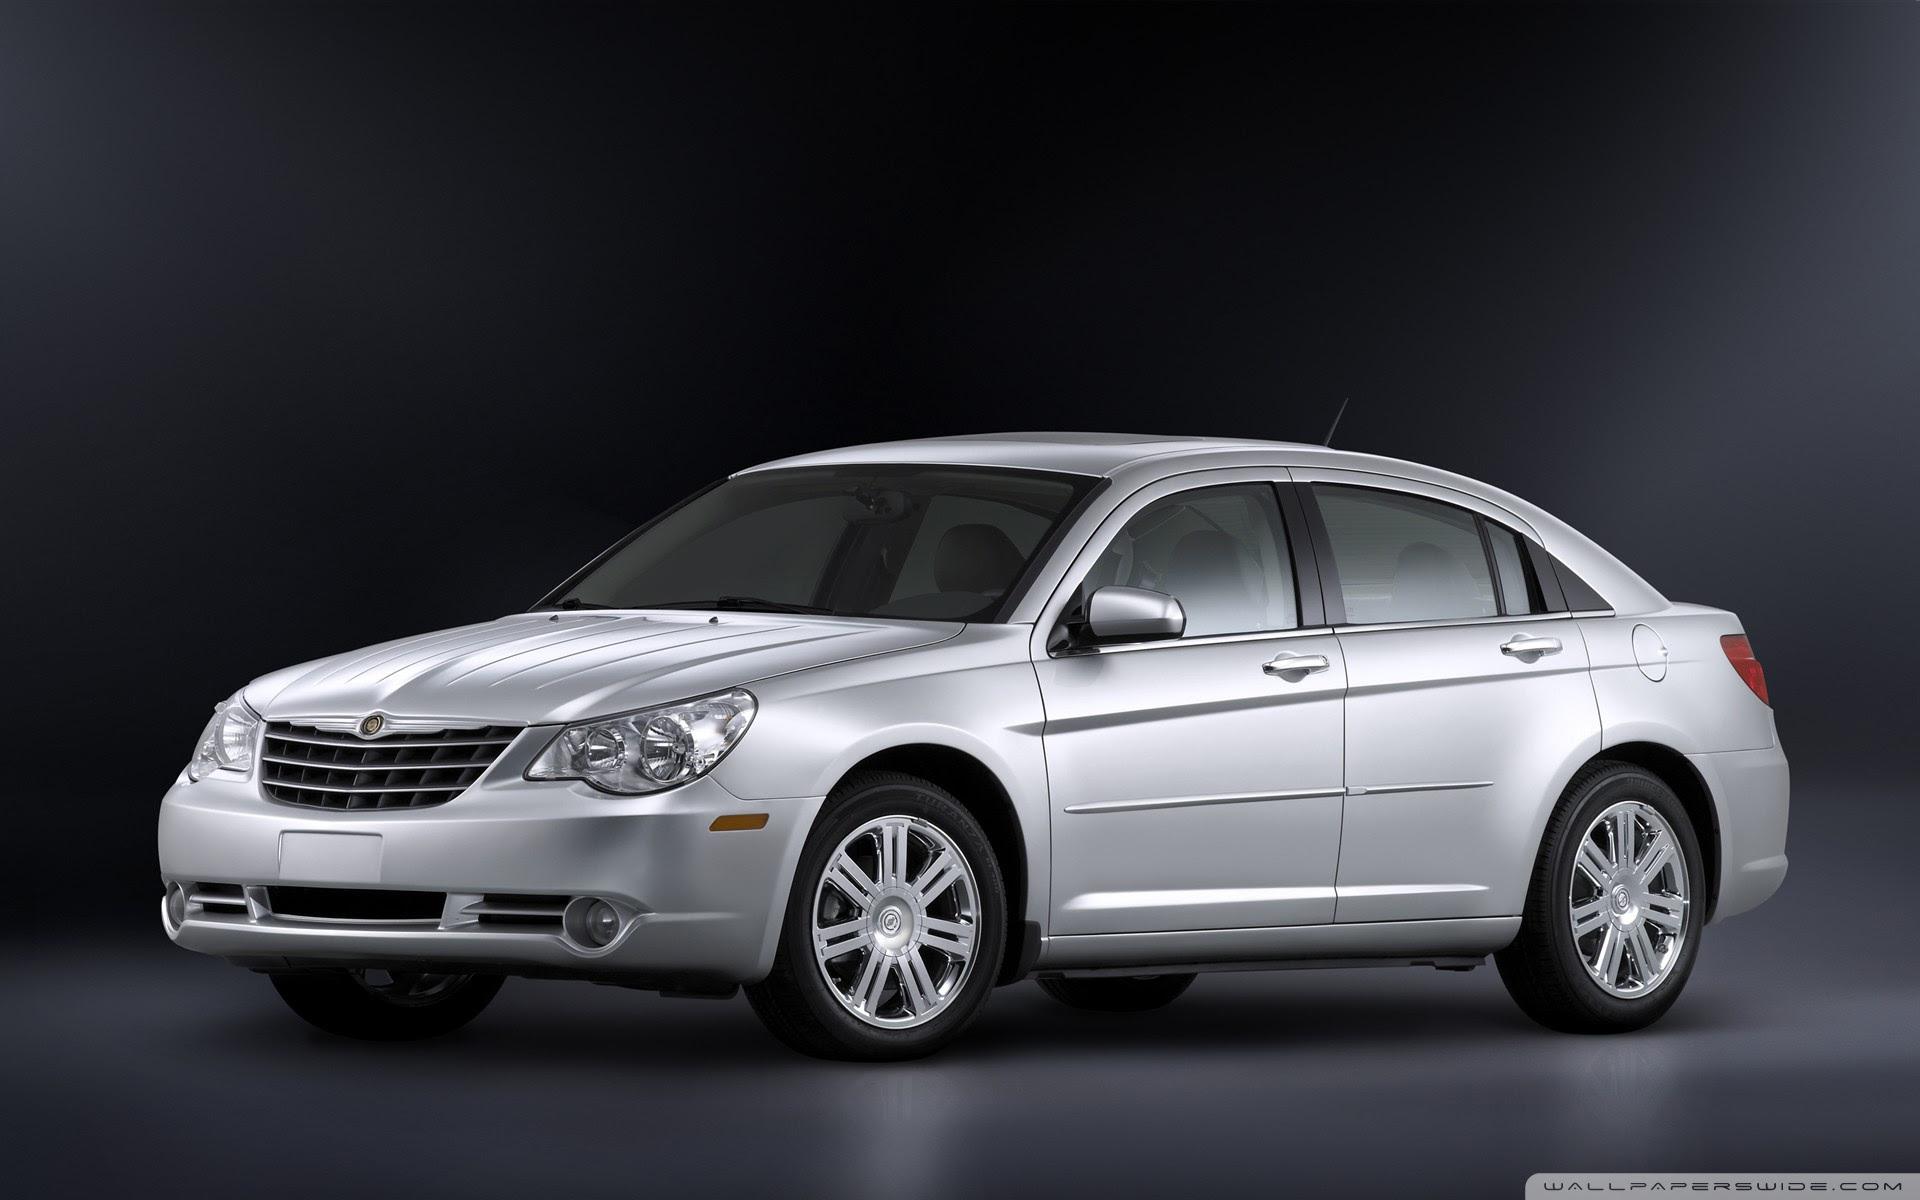 97 Chrysler Cirru Fuse Box